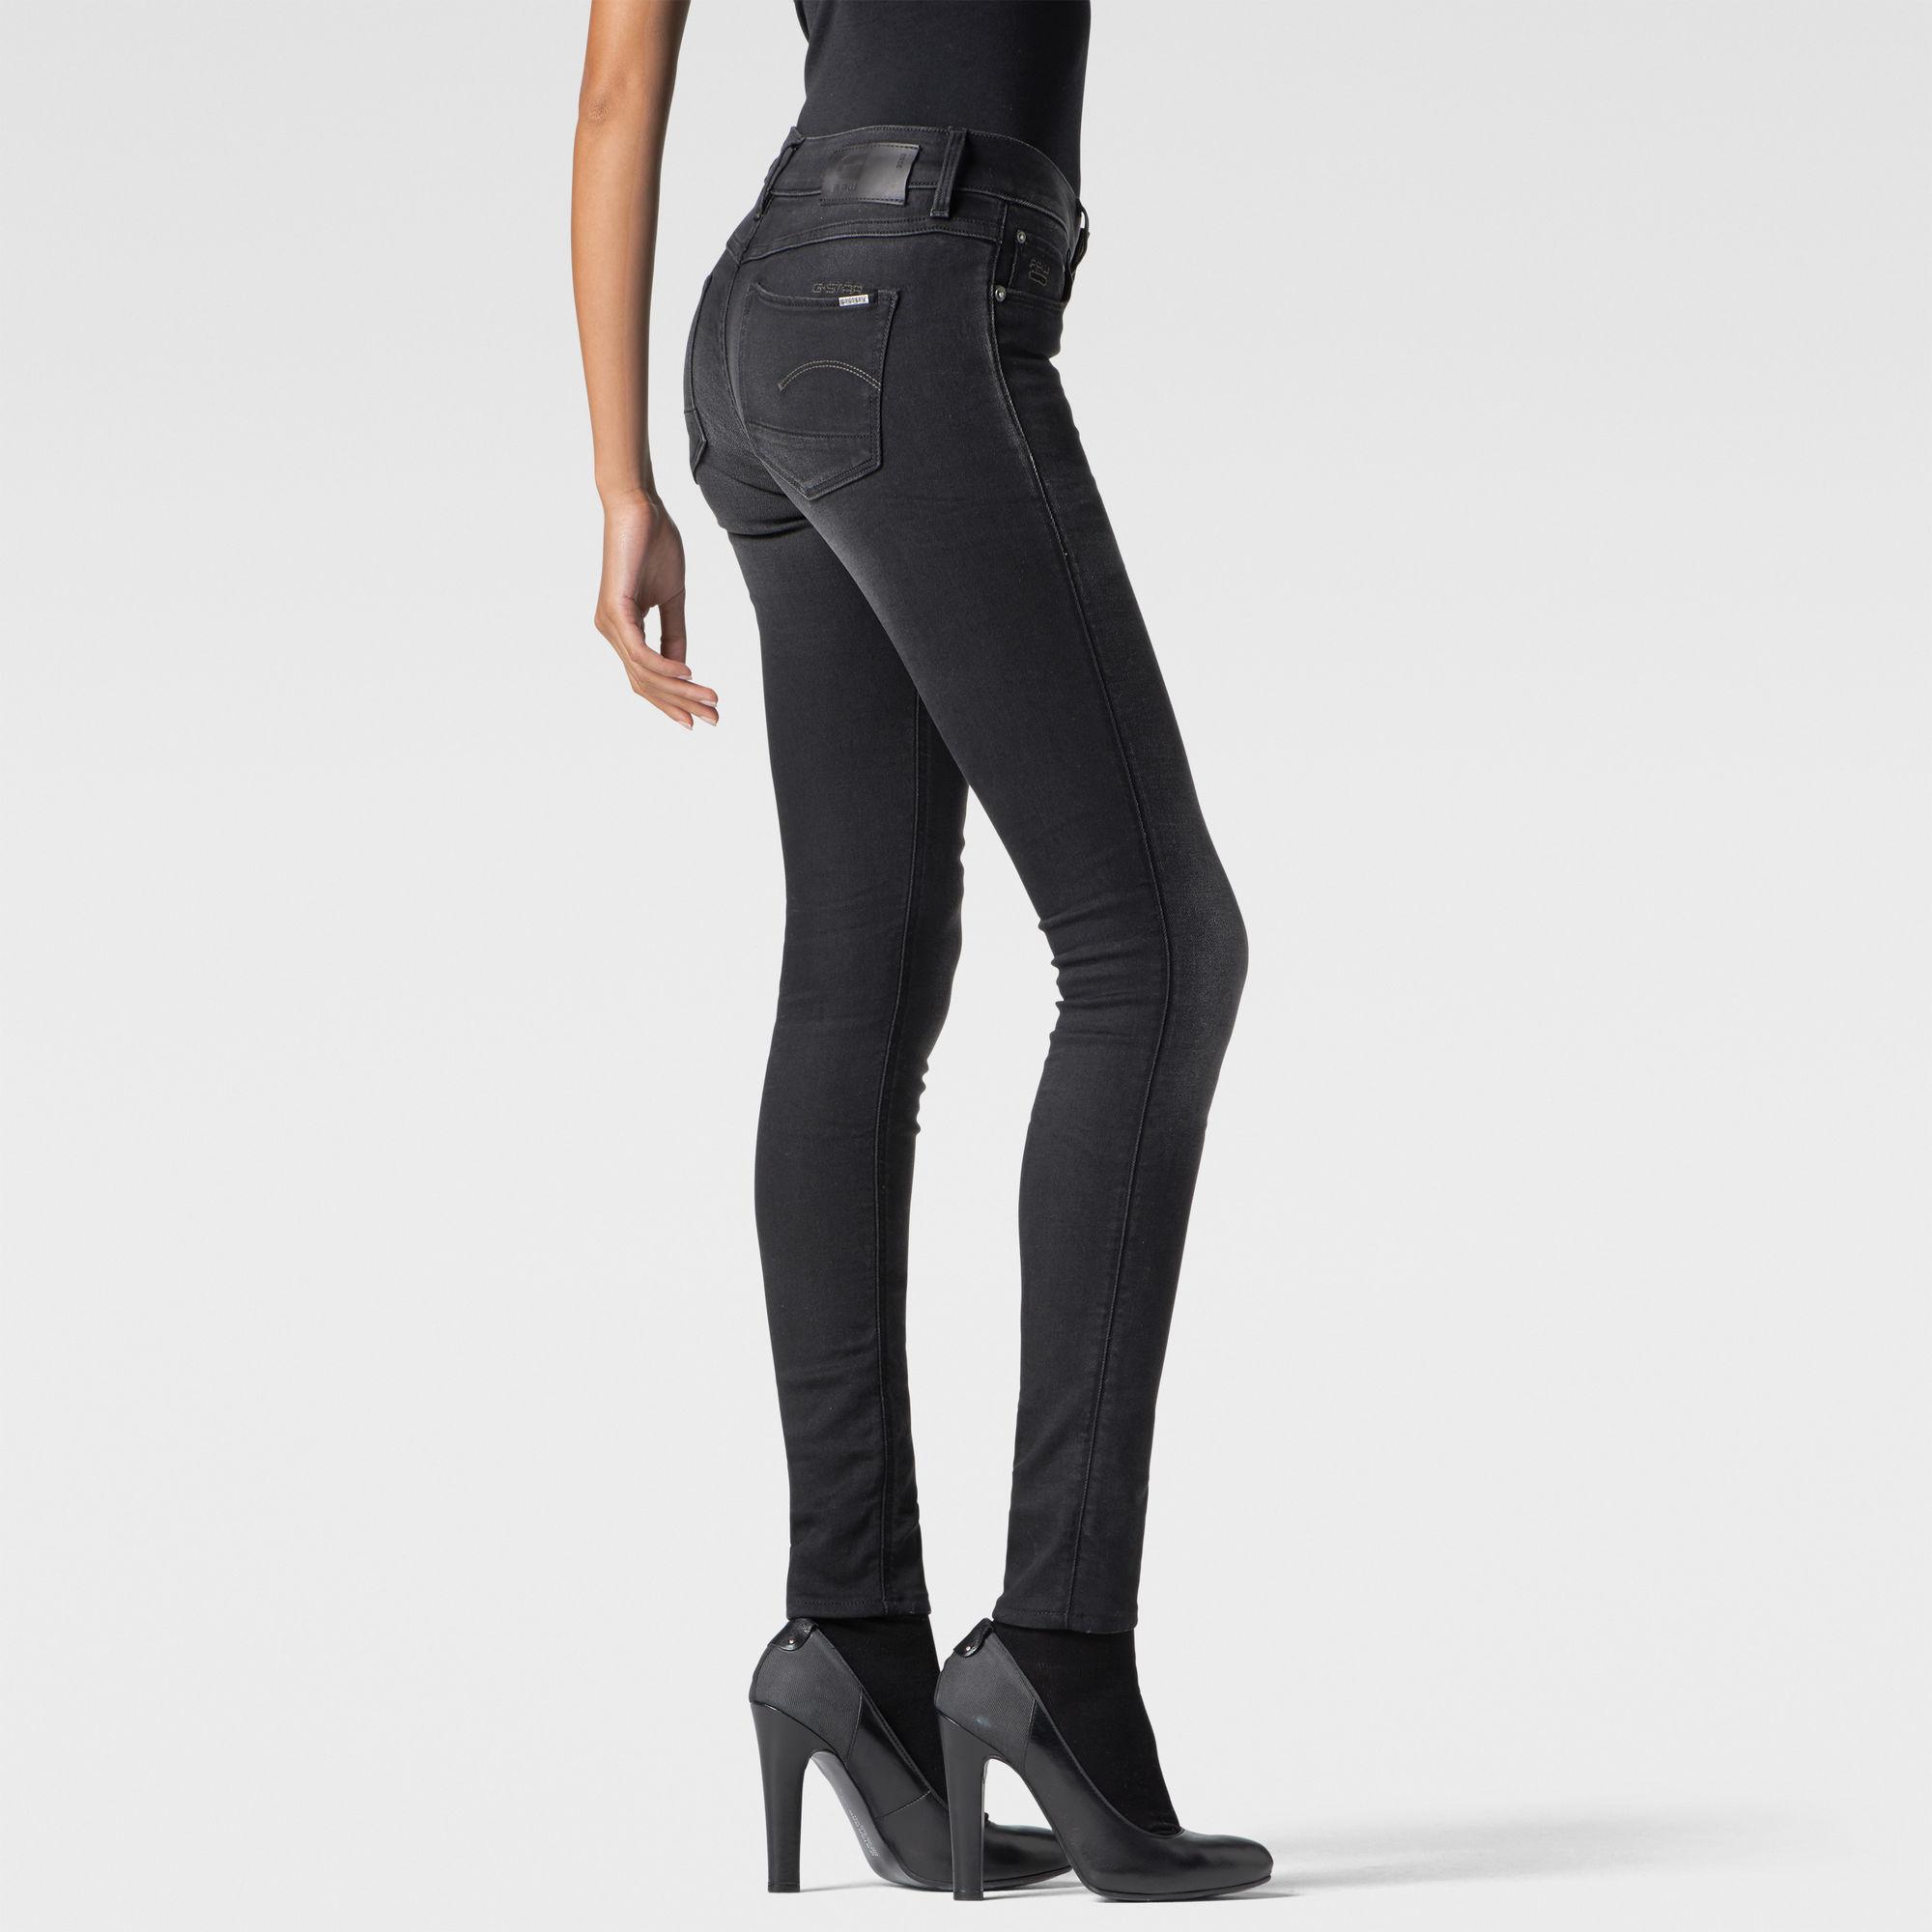 3301 Mid Waist Contour Skinny Jeans